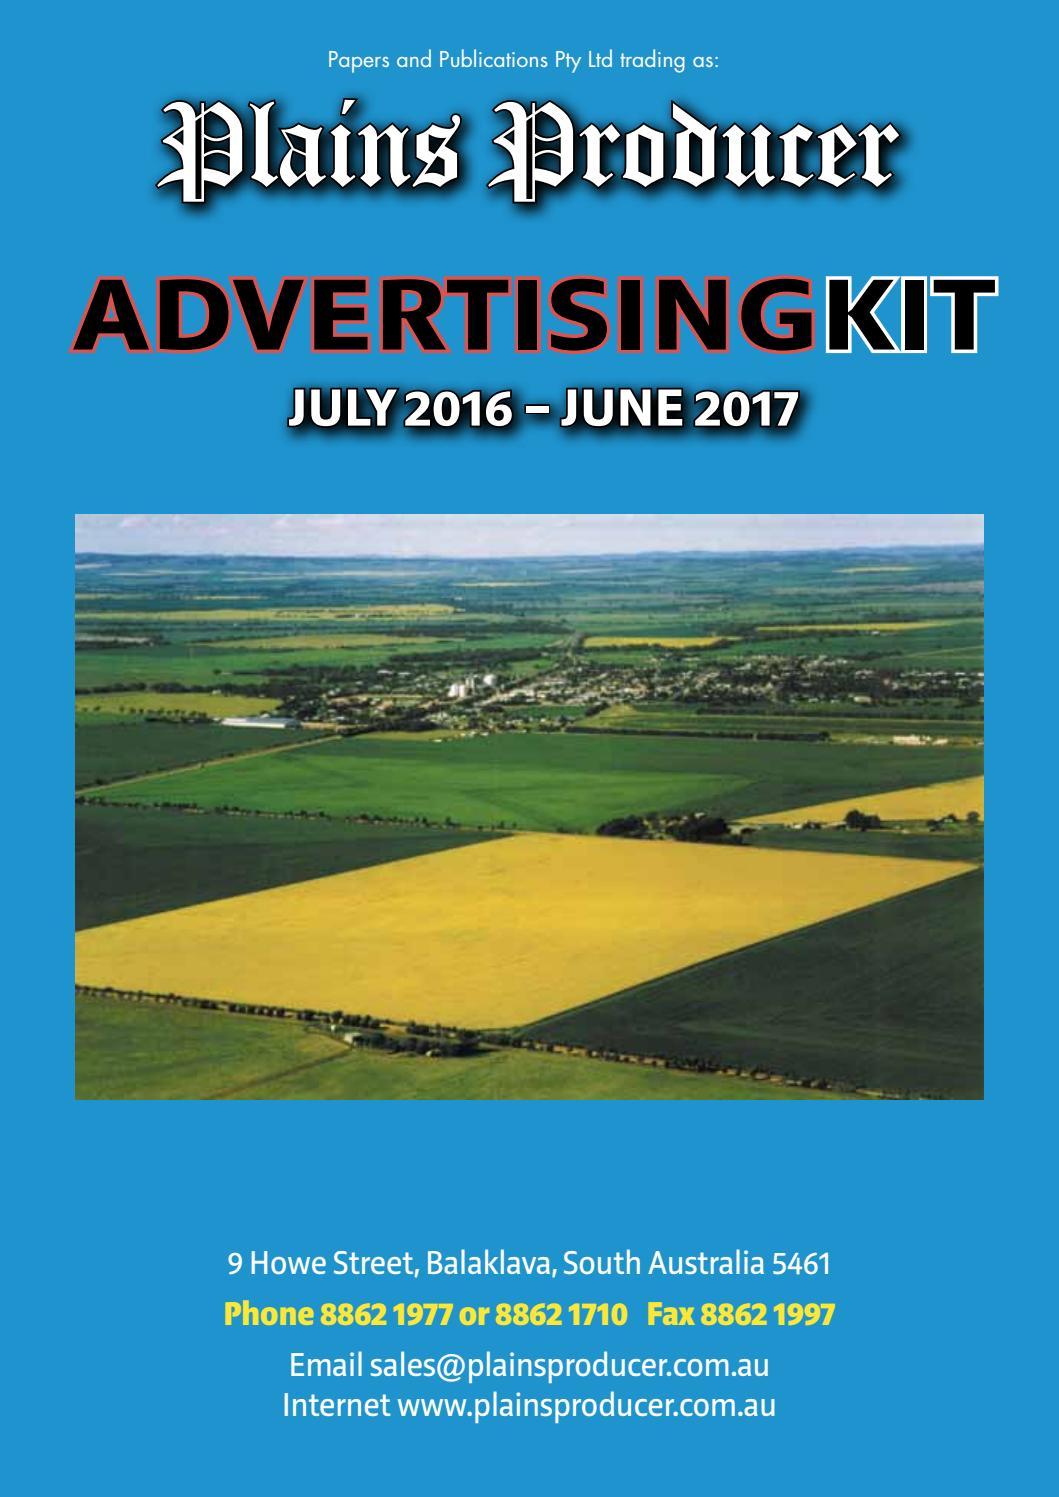 full advertising kit 2016 2017 by plains producer issuu